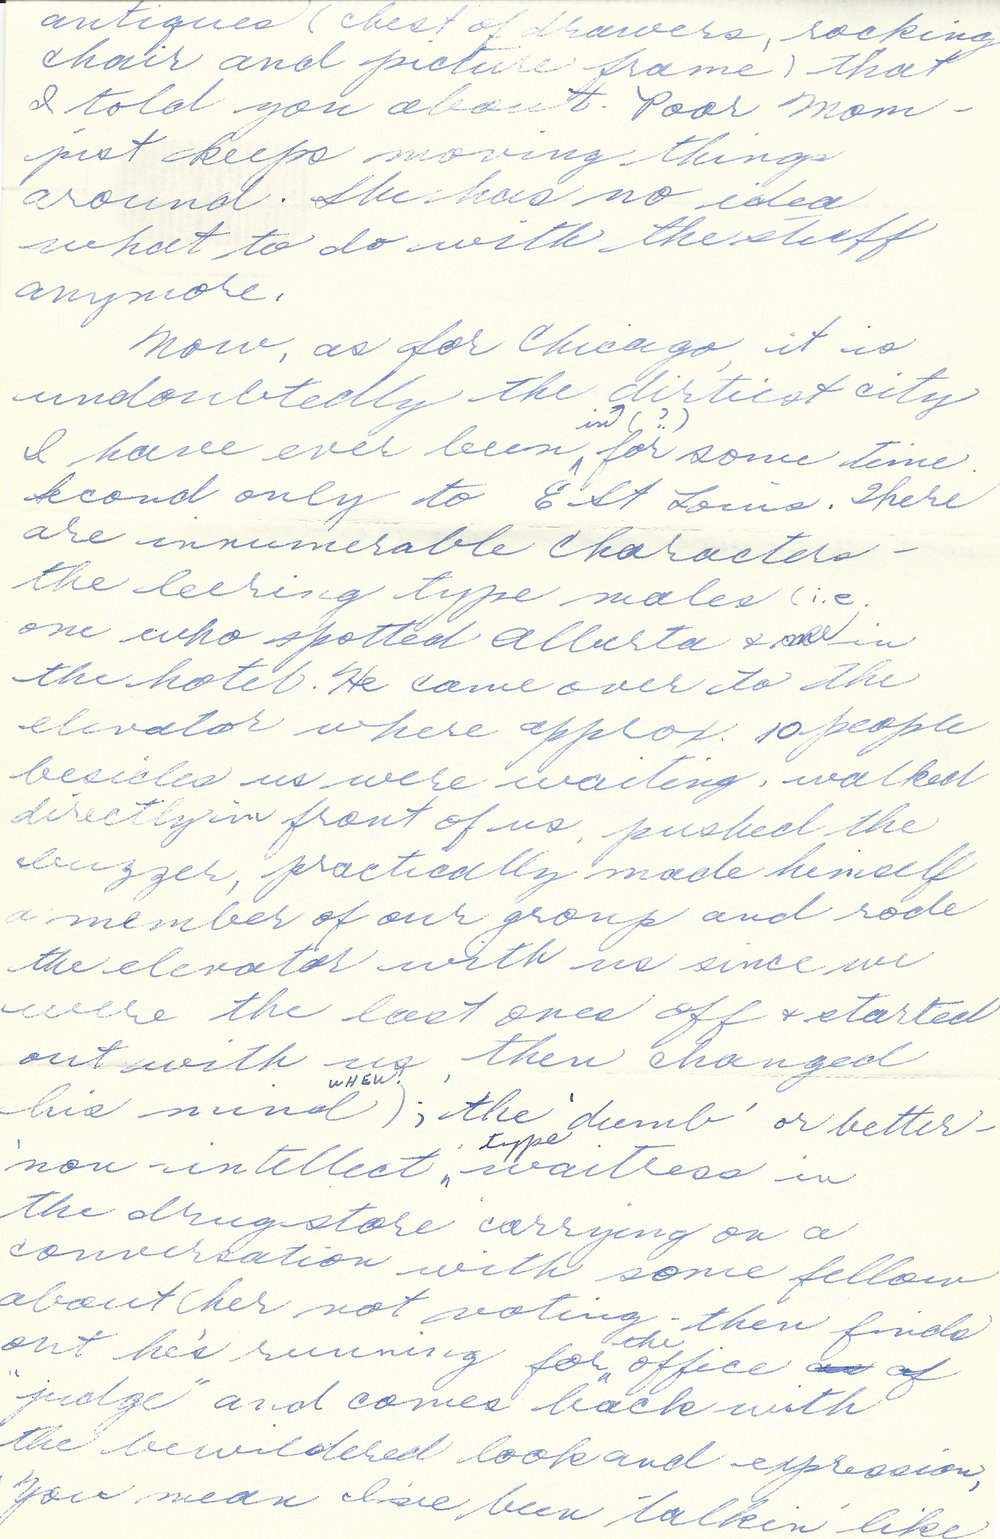 7. Oct. 9-21, 1952 (Oma)_Page_05.jpg